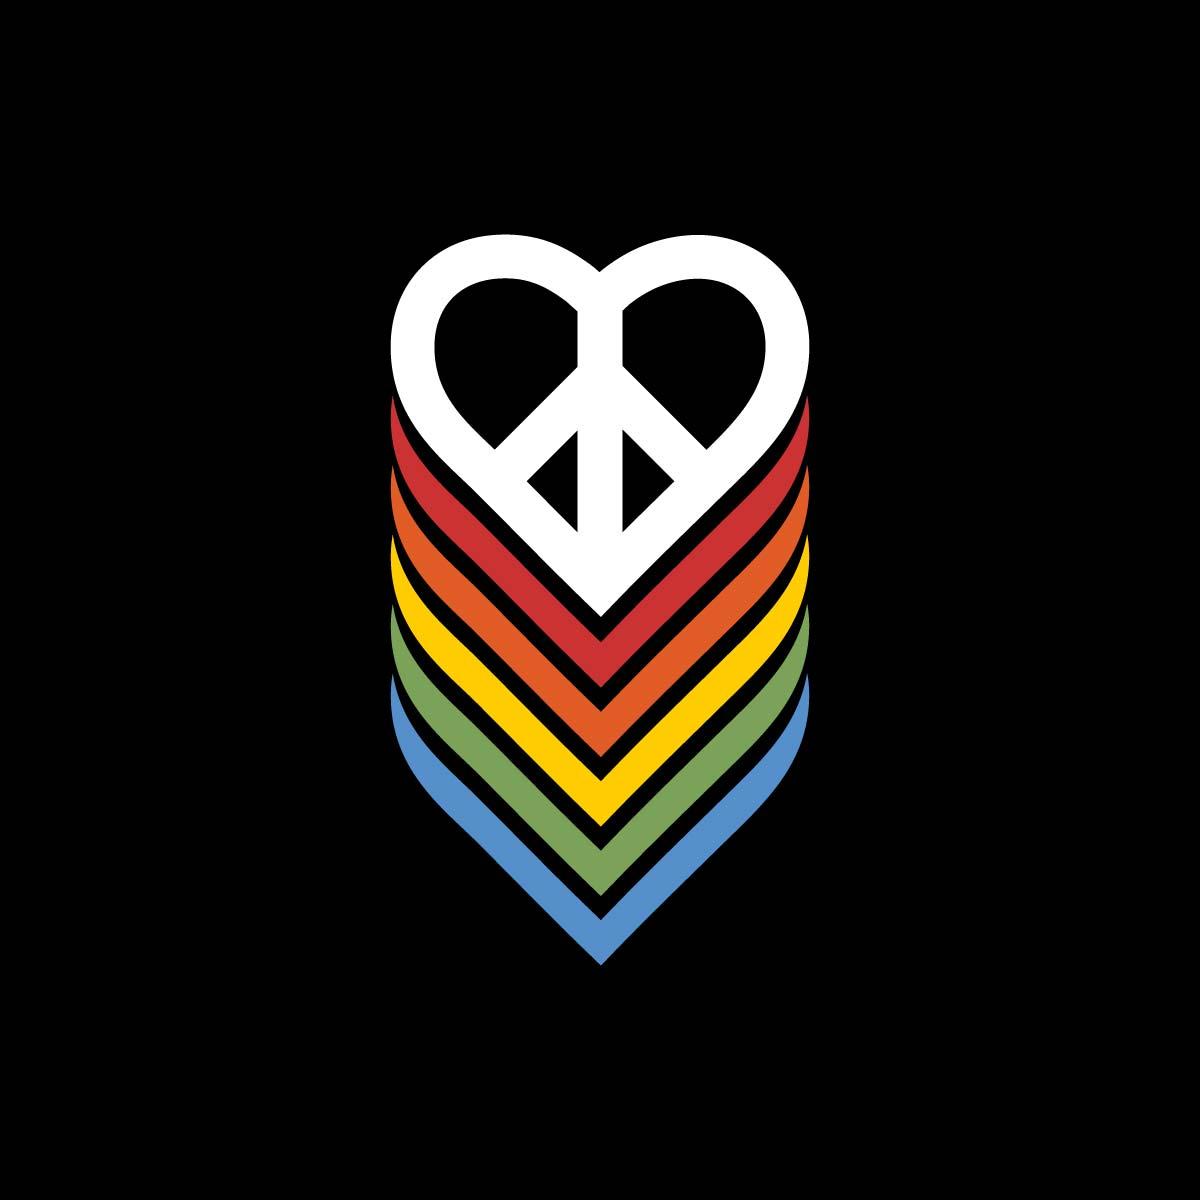 PEACE AND LOVE RAINBOW HEART design by kikicutt sweatpants store